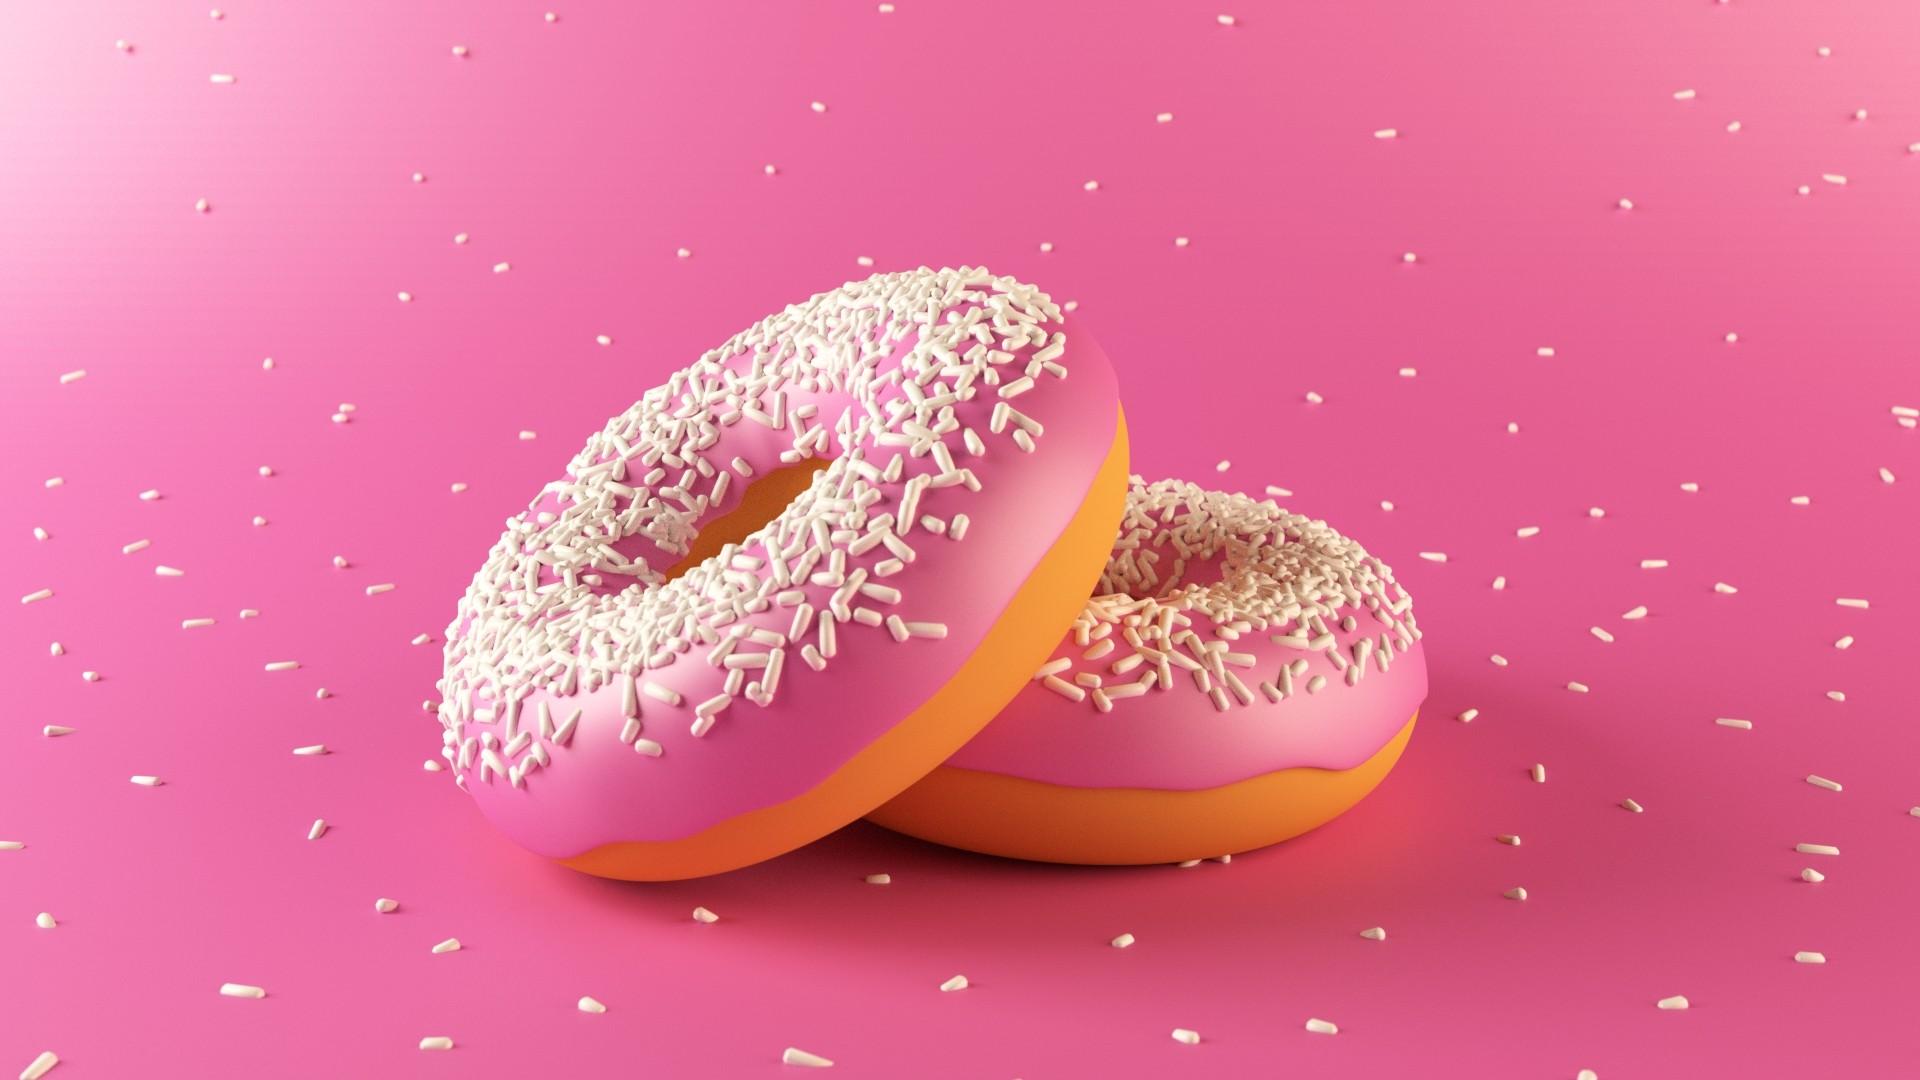 Donut HD Wallpaper